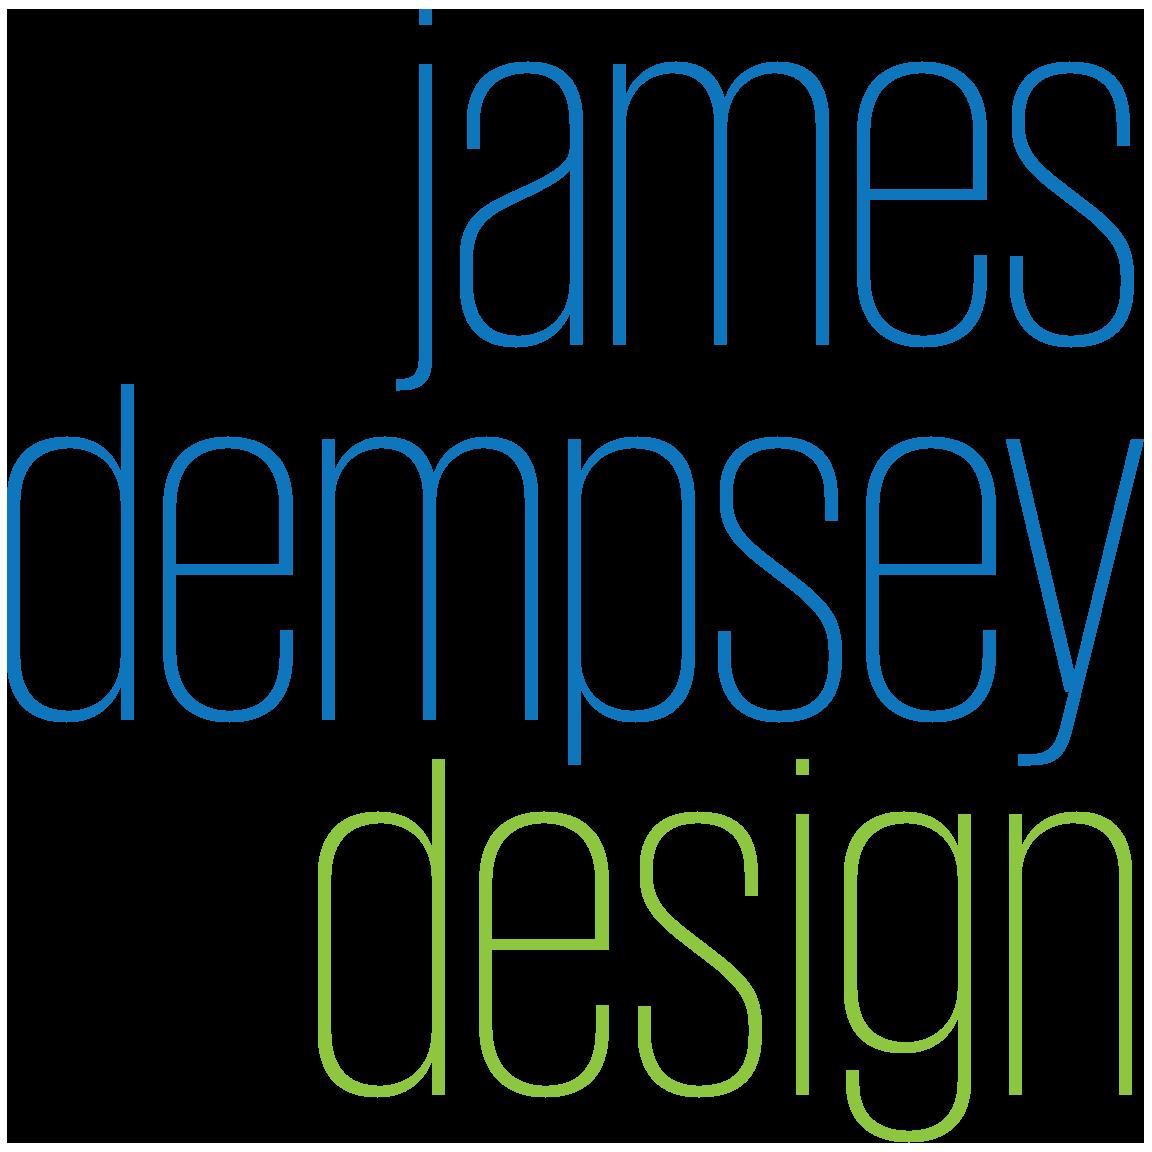 James Dempsey Design